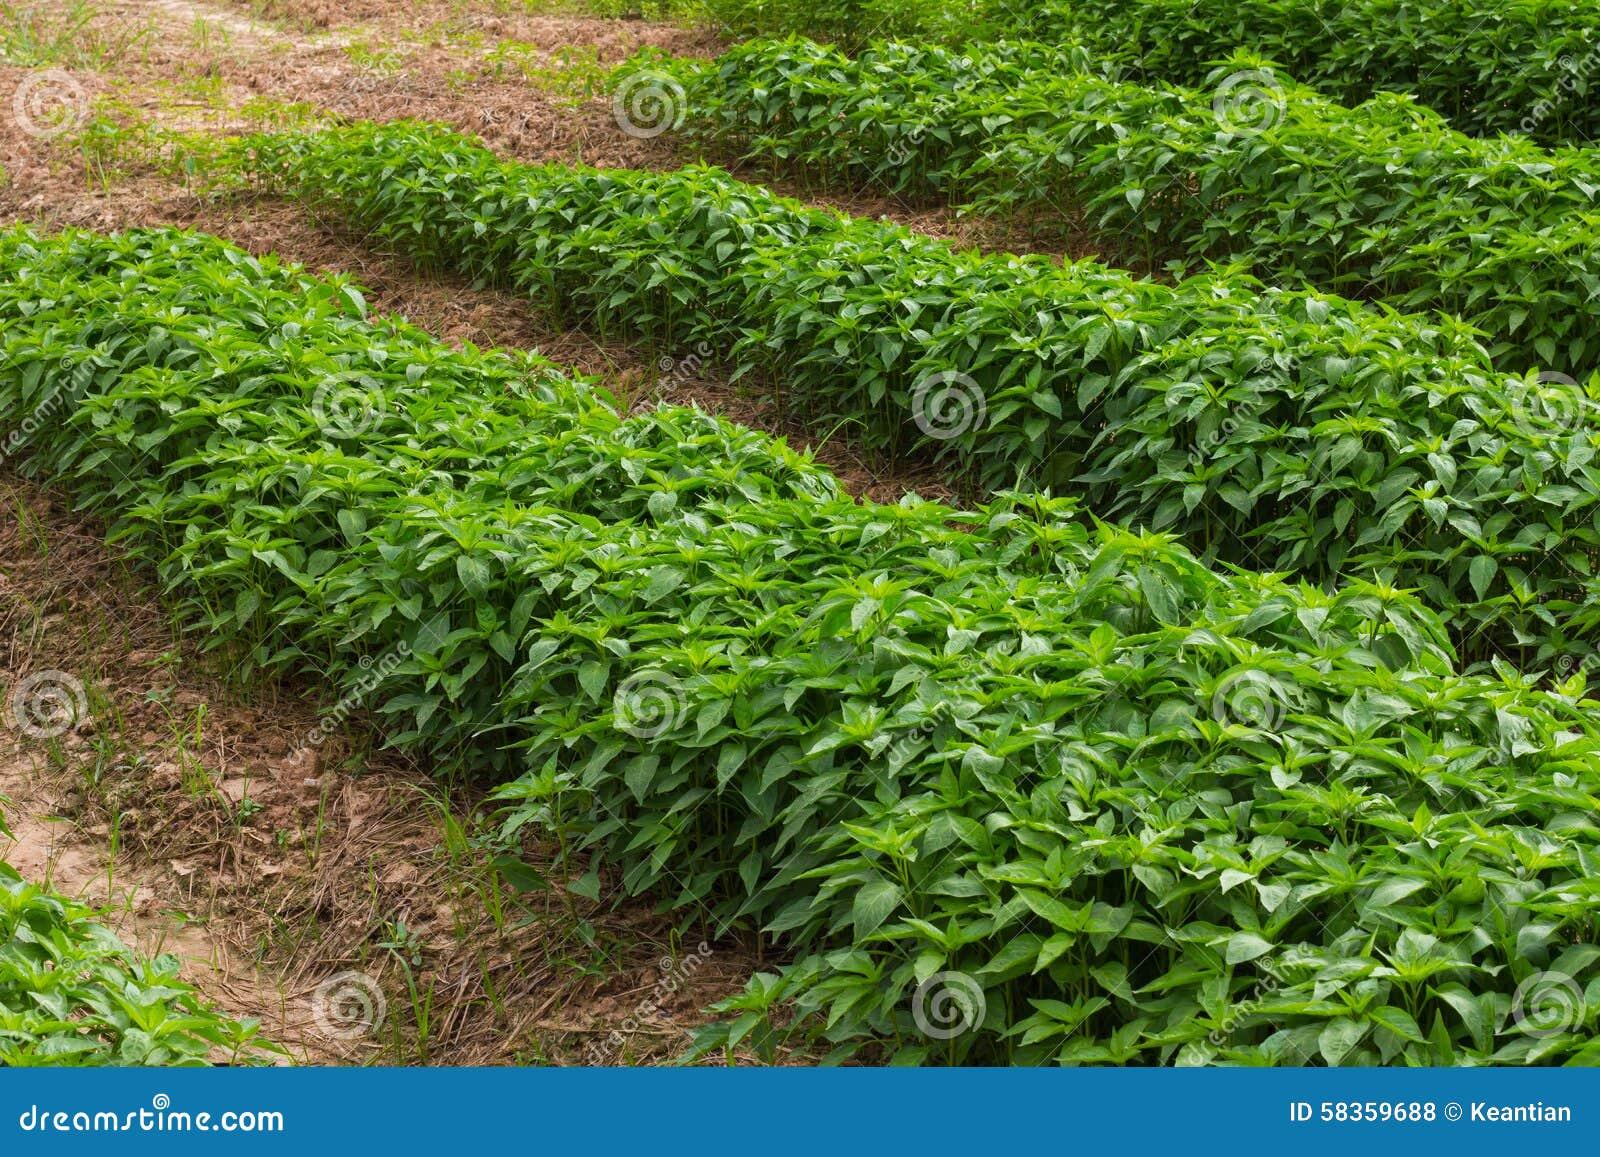 Plantation poivron - Quand planter les poivrons ...